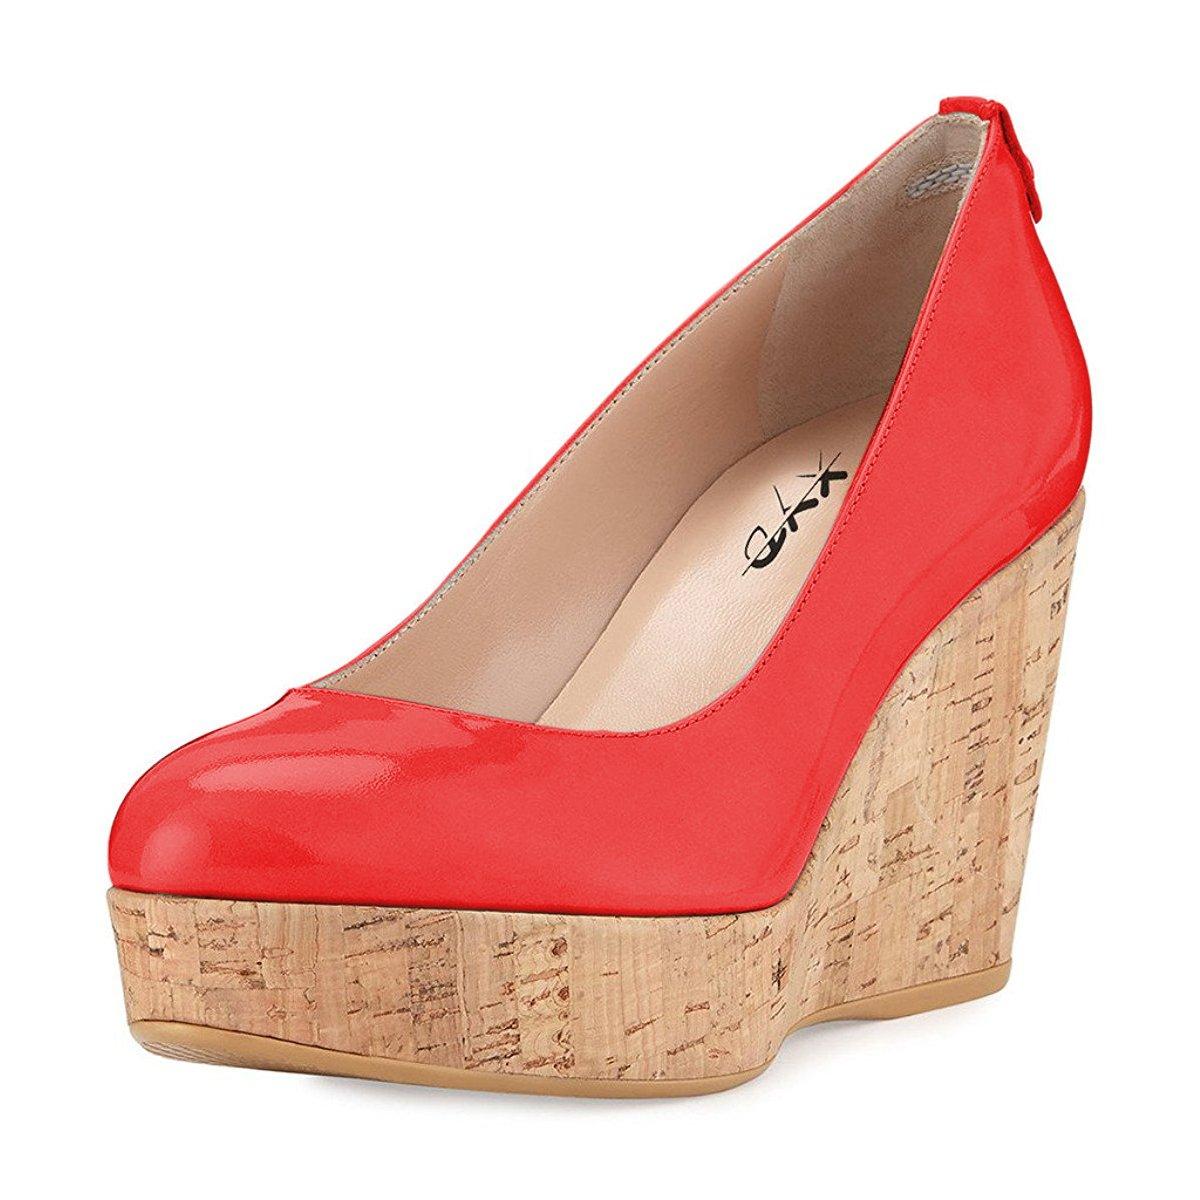 d7c393fc332 XYD Women Comfort Round Toe Platform Pumps Slip On Patent Wedge Cork High  Heel Shoes